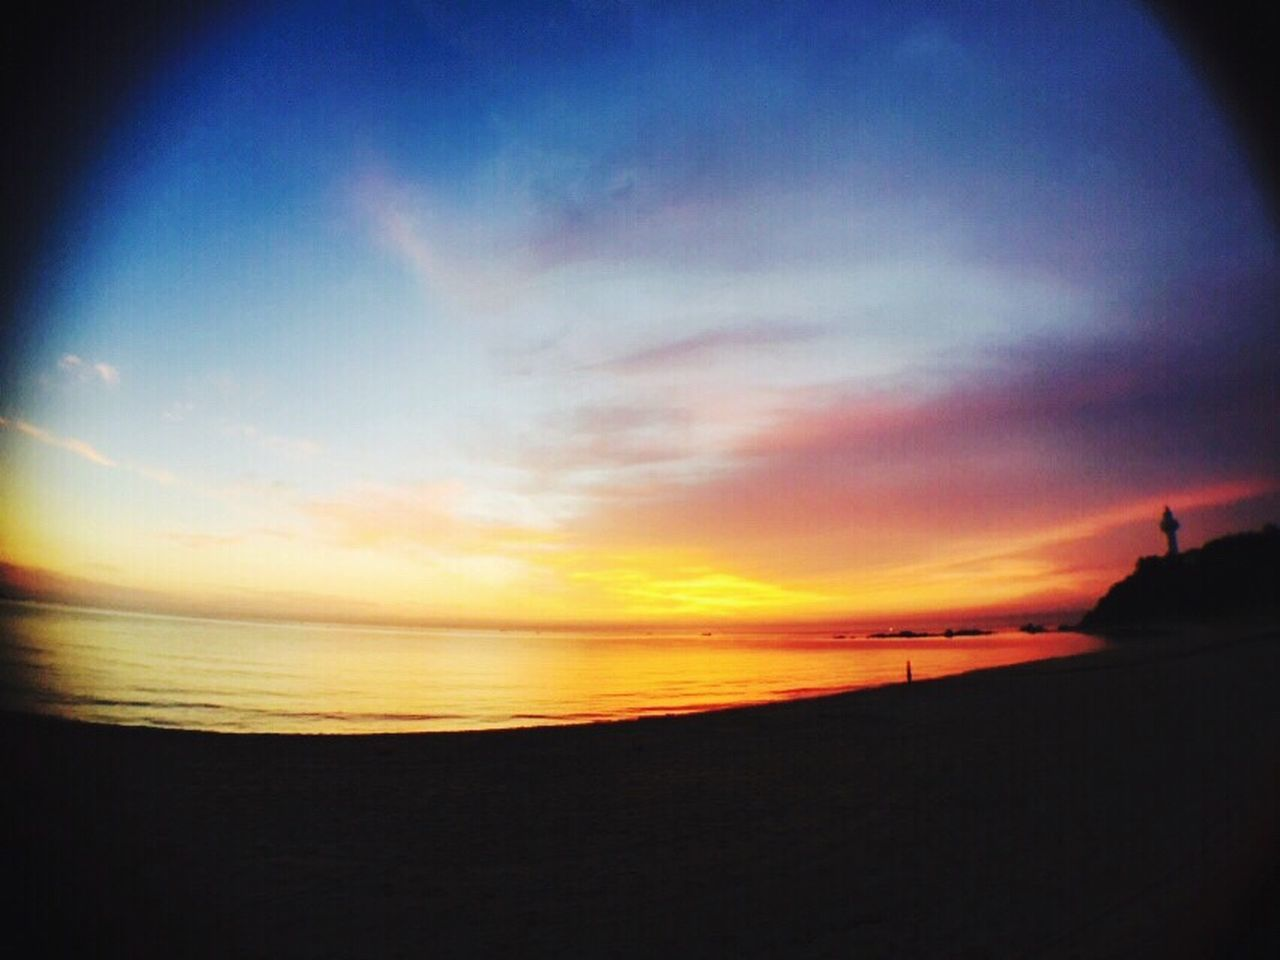 East Sea Korea Sea Sky Sunset Beach Nature Wide-angle Lens IPhone First Eyeem Photo Long Goodbye